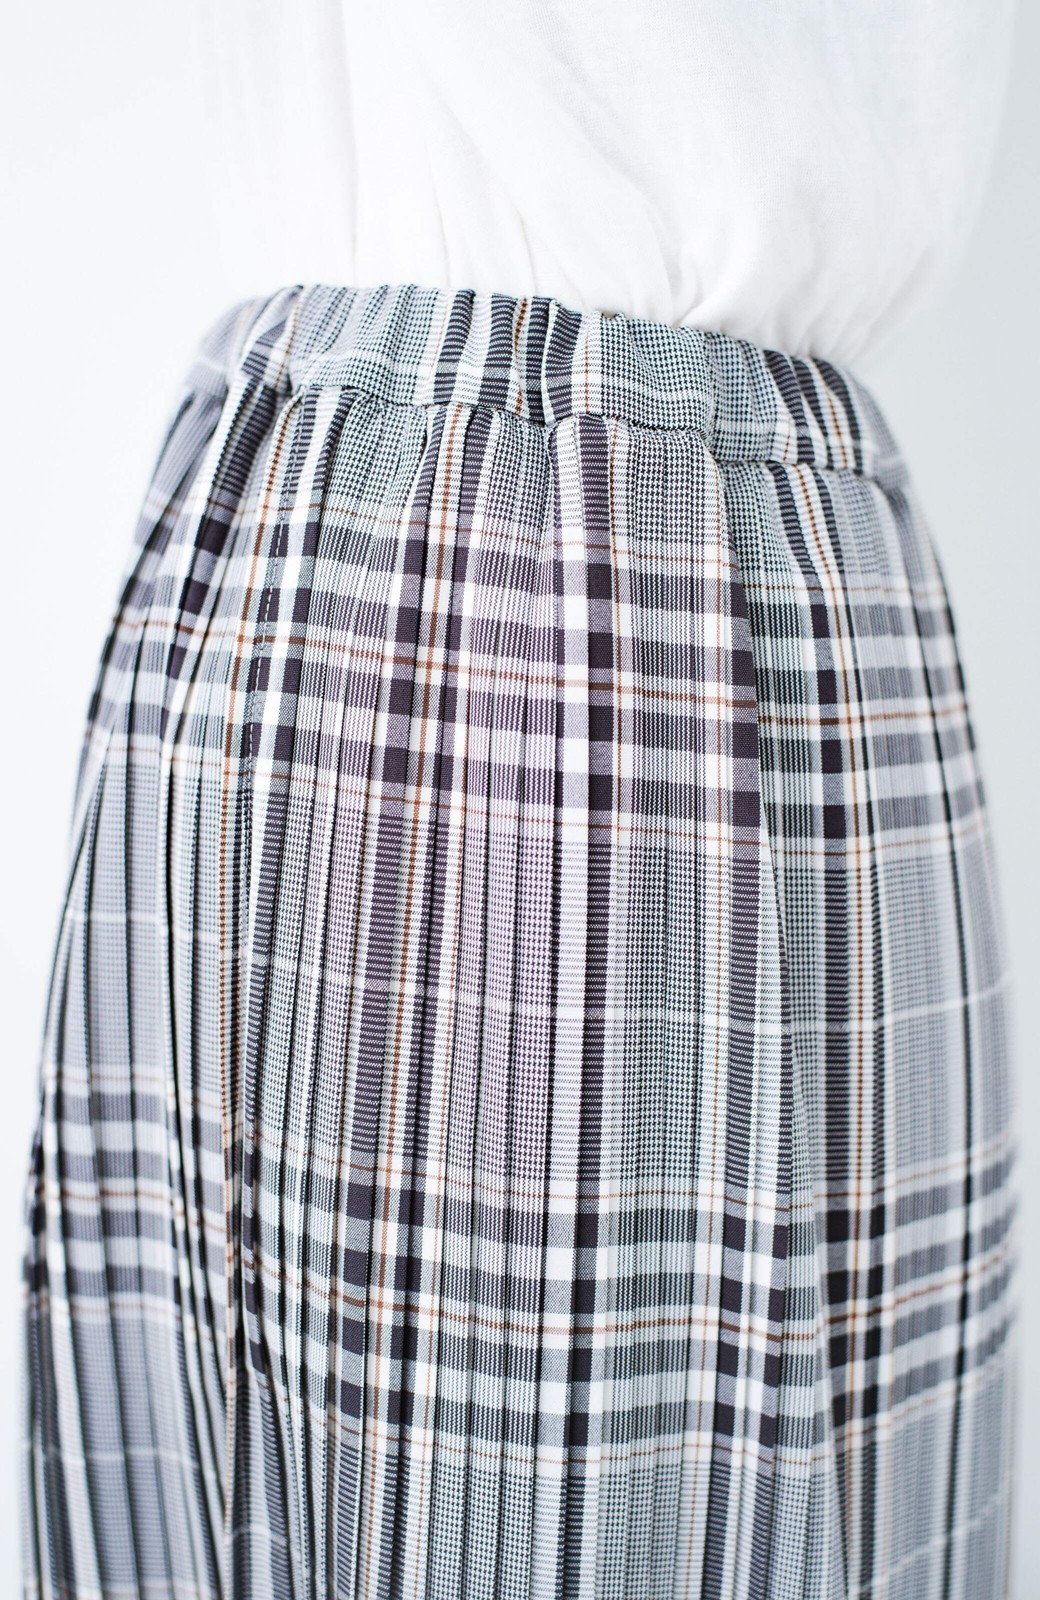 haco! 着こなし無限!自由自在なスリットロングニットとチェックプリーツスカートとチュール巻きスカートの3点セット <ブラック>の商品写真37